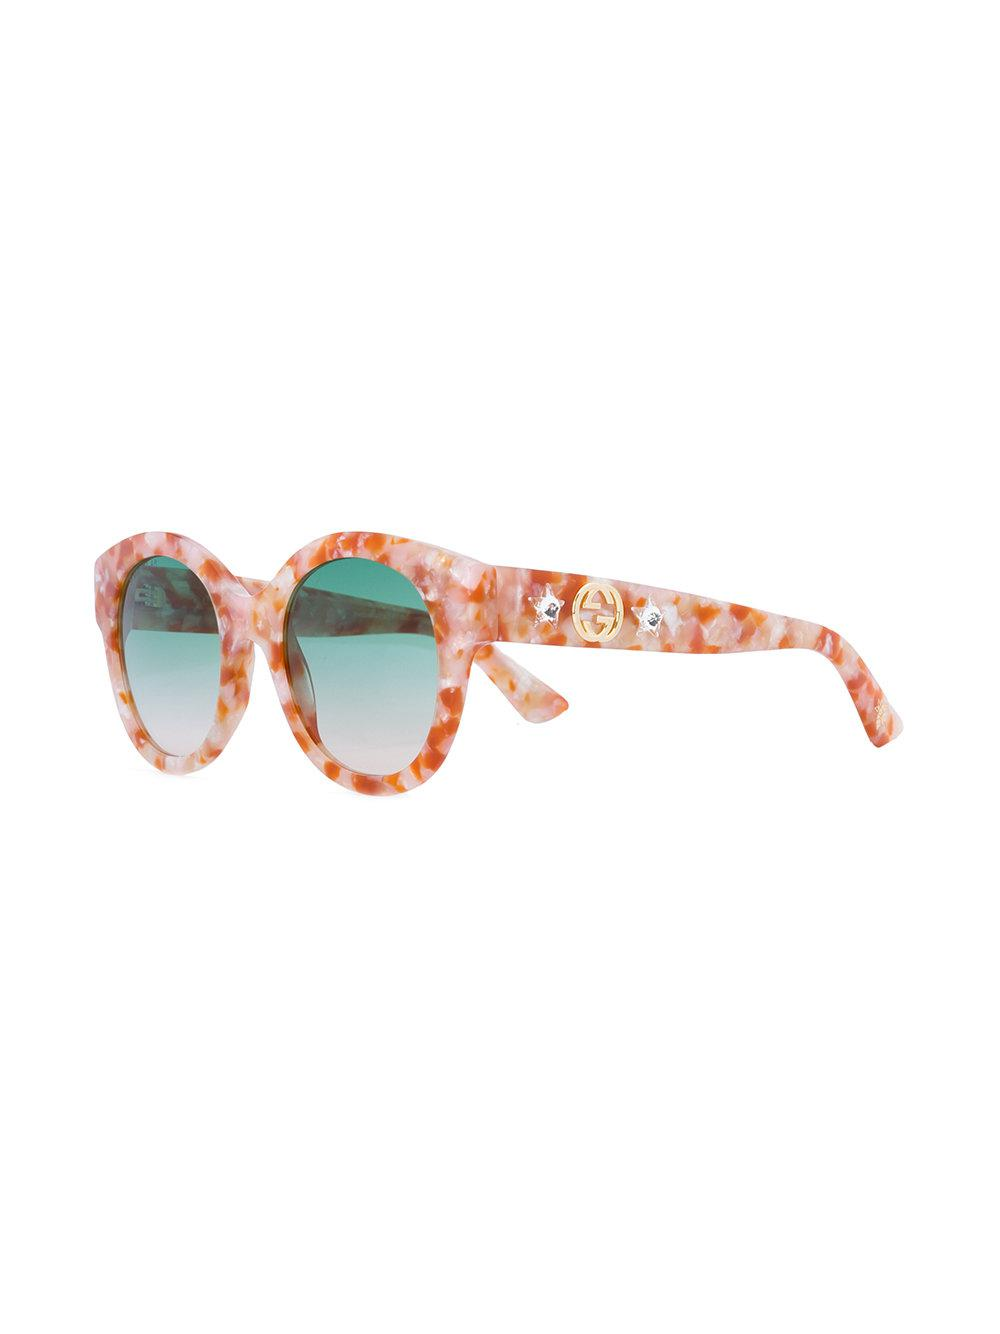 605a082276 Gucci. Women s Round-frame Star Sunglasses